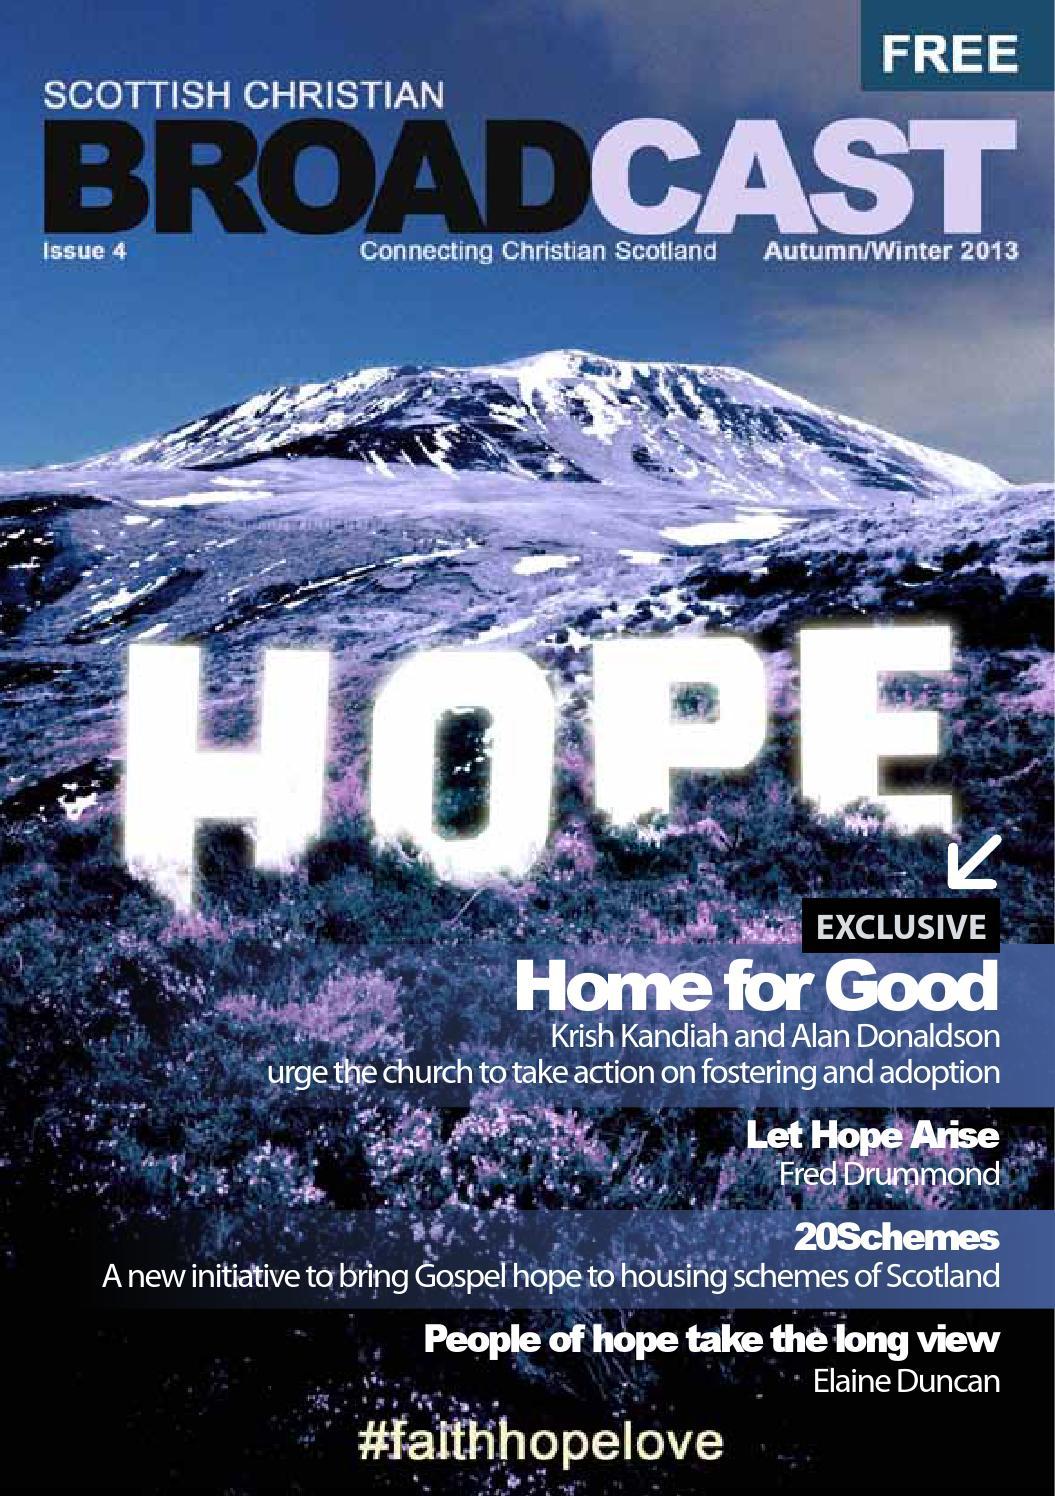 Scottish Christian Broadcast Magazine - Autumn Winter 2013 by